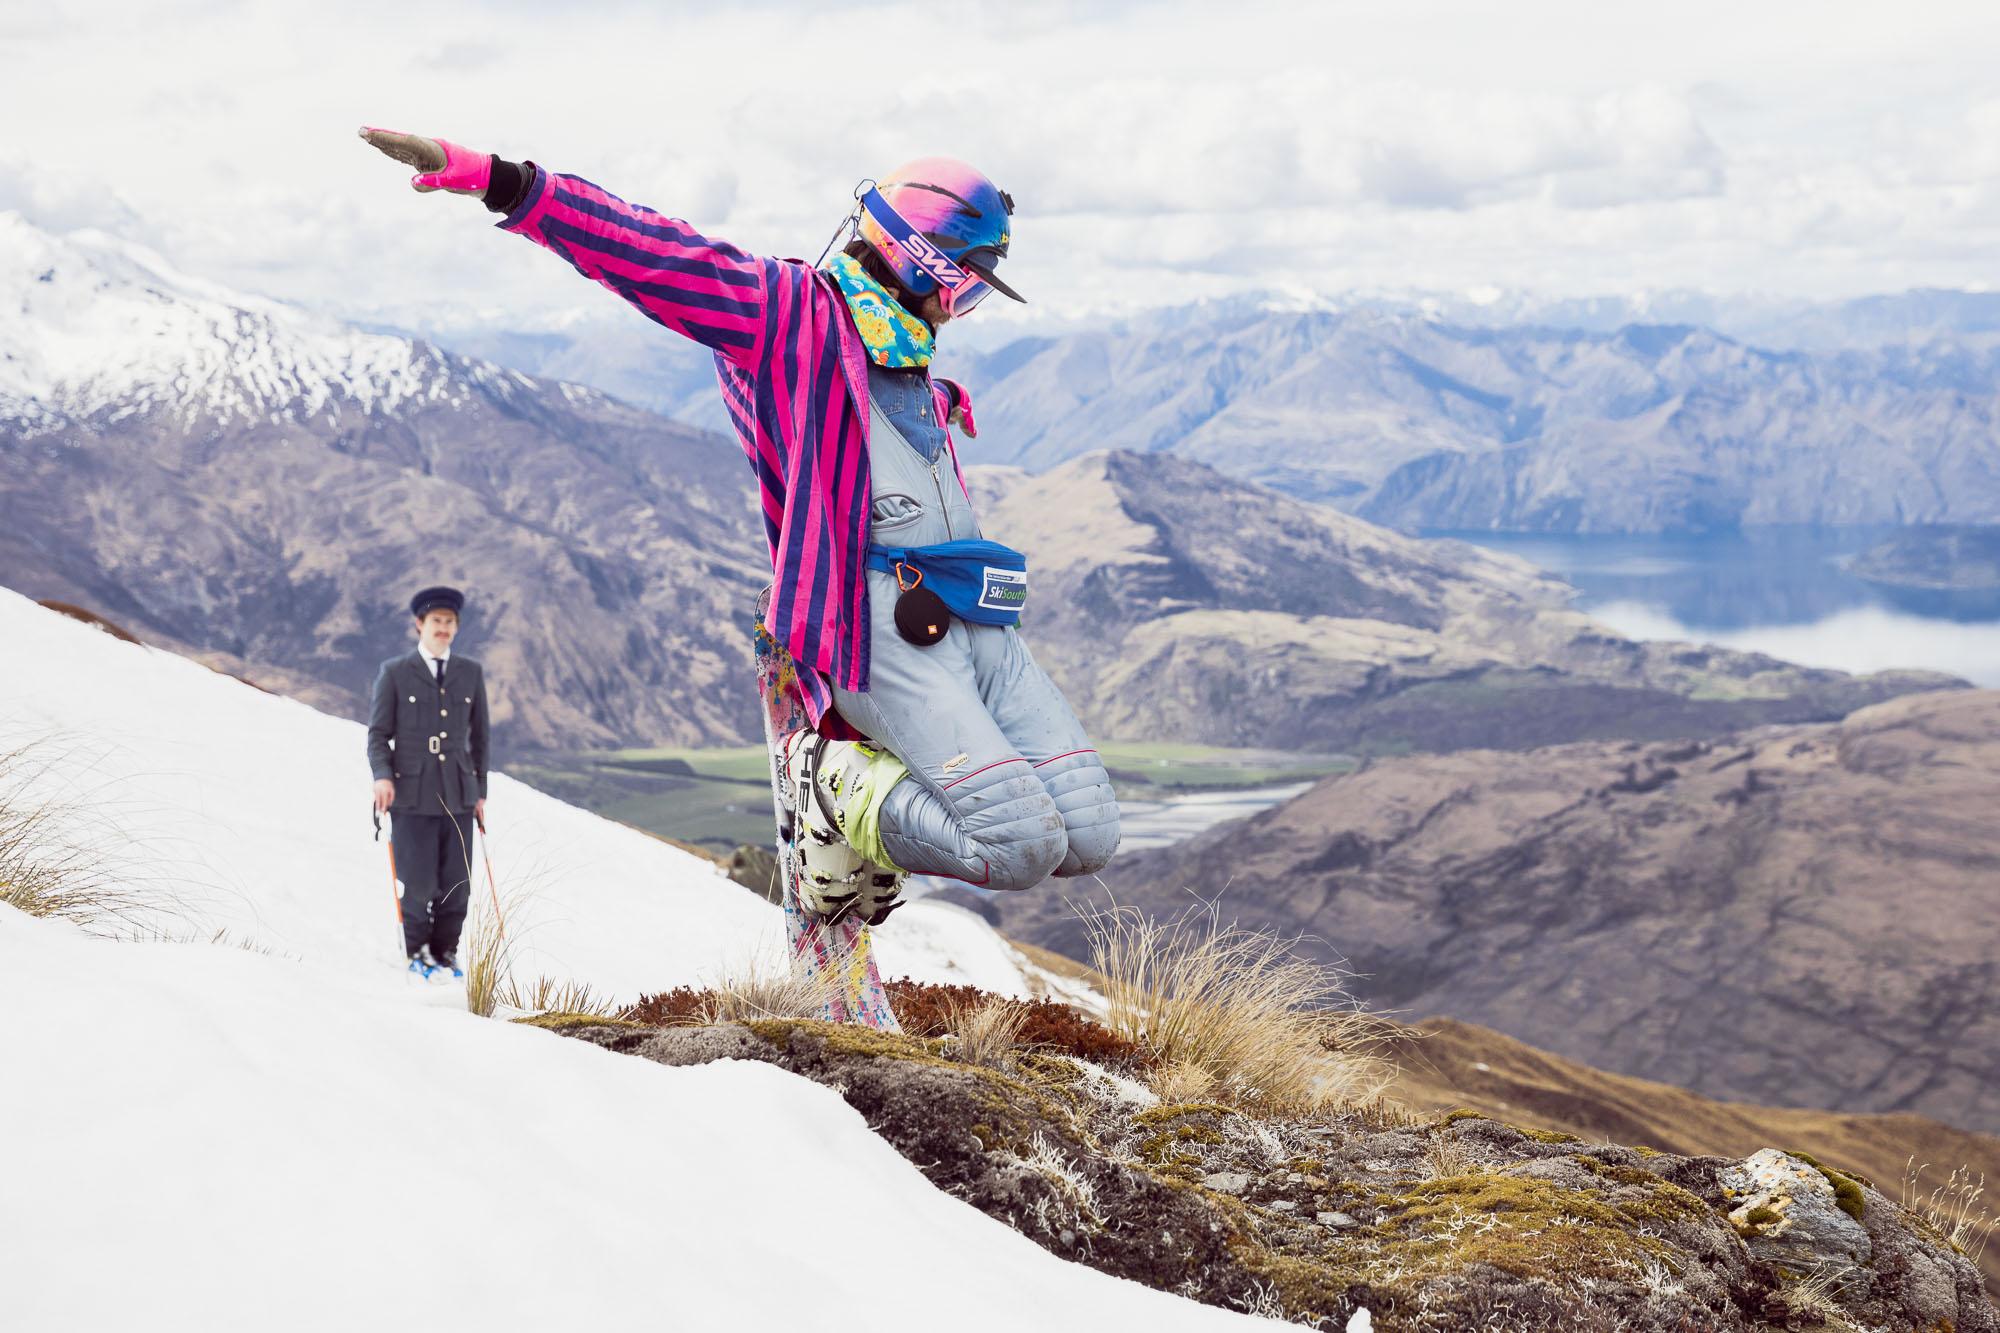 The reason I ski?              Because its fun of course!                                                           Photo - Mark Clinton